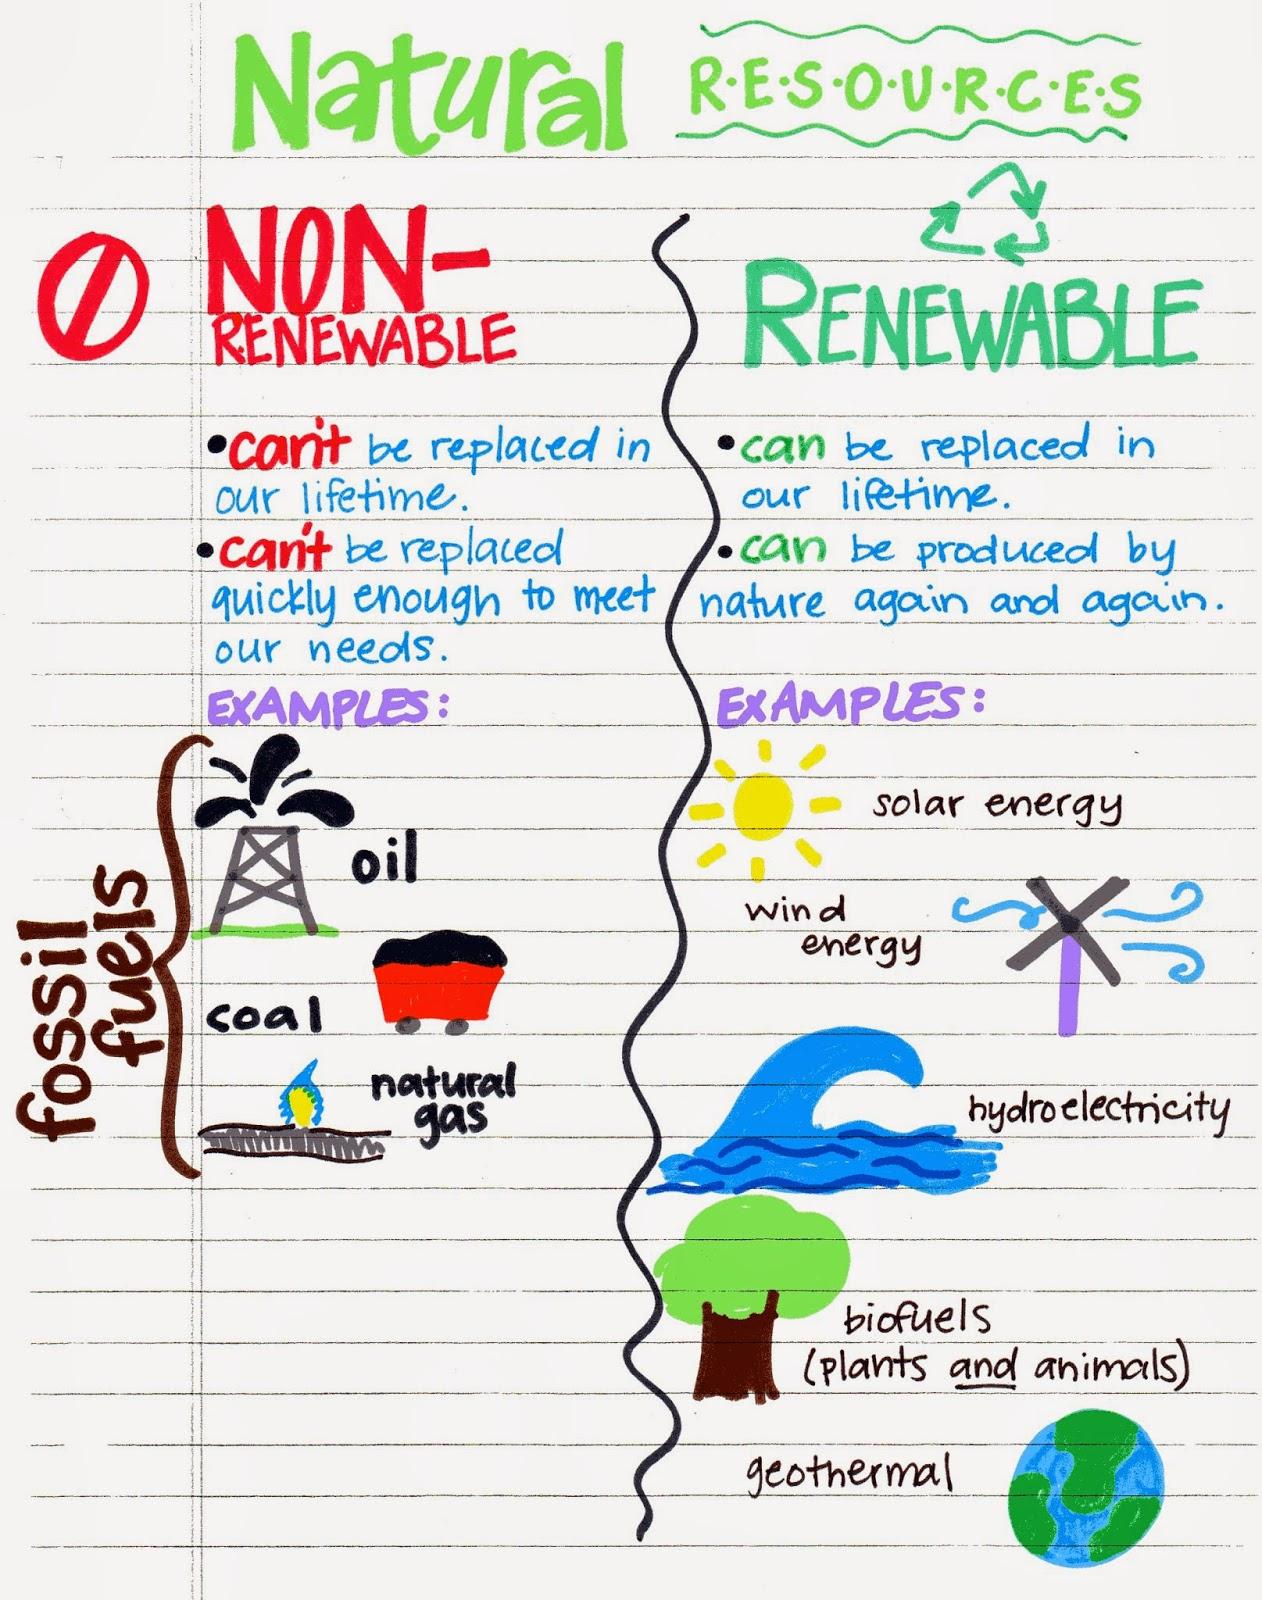 Worksheet Alternative Natural Resources miss vs class alternative energy resources 5 7c class